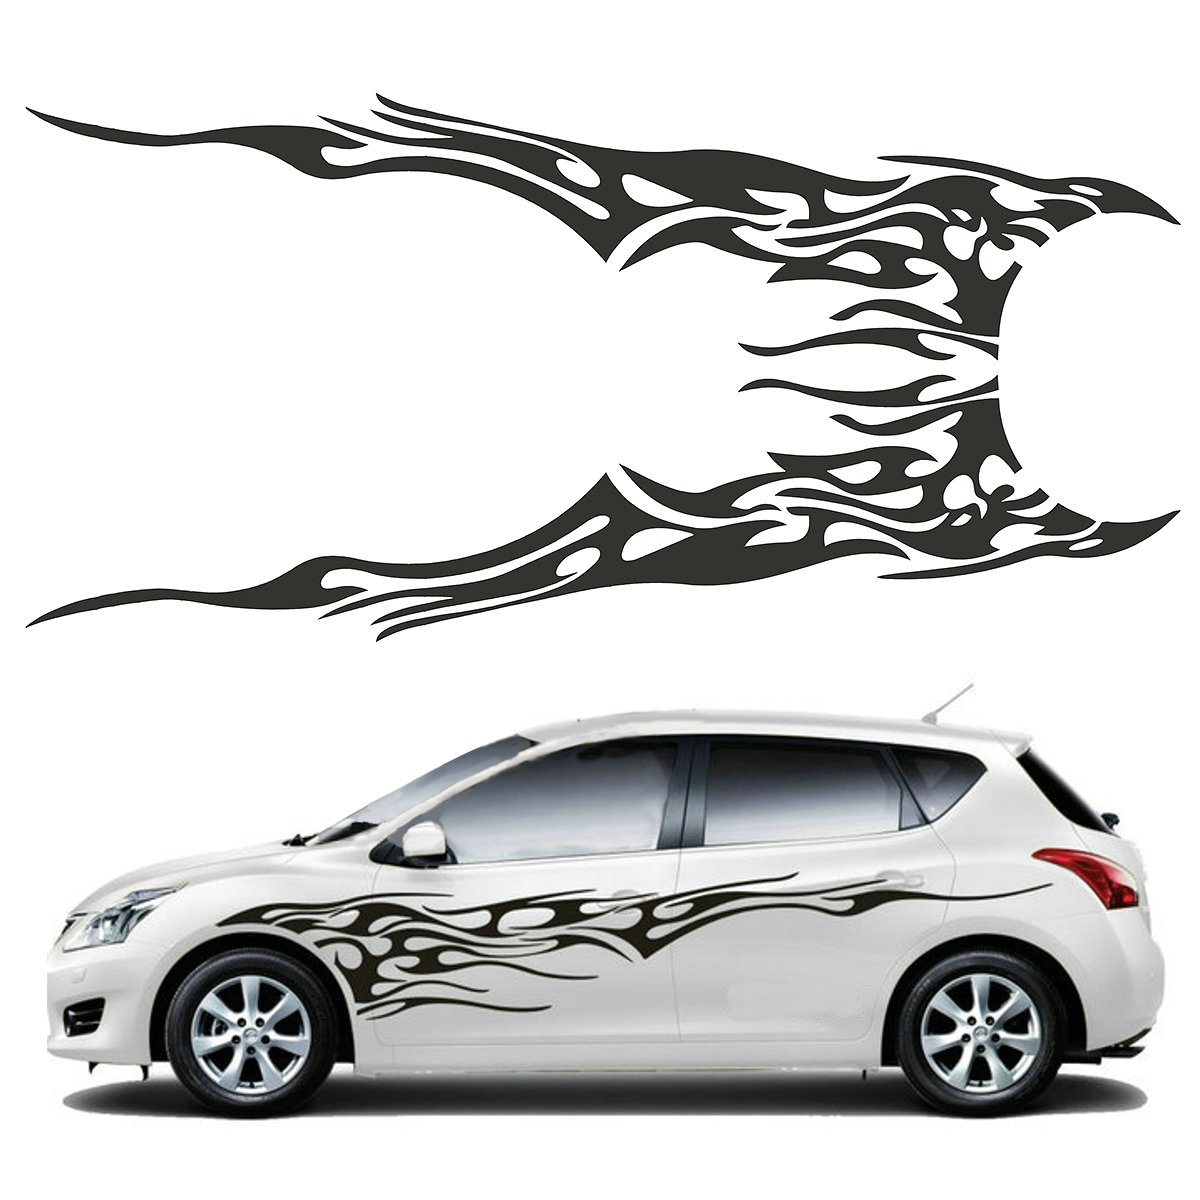 Car sticker design black - Pair 210 5 X 48cm Black Universal Car Flame Graphics Vinyl Car Side Sticker Decal Waterproof